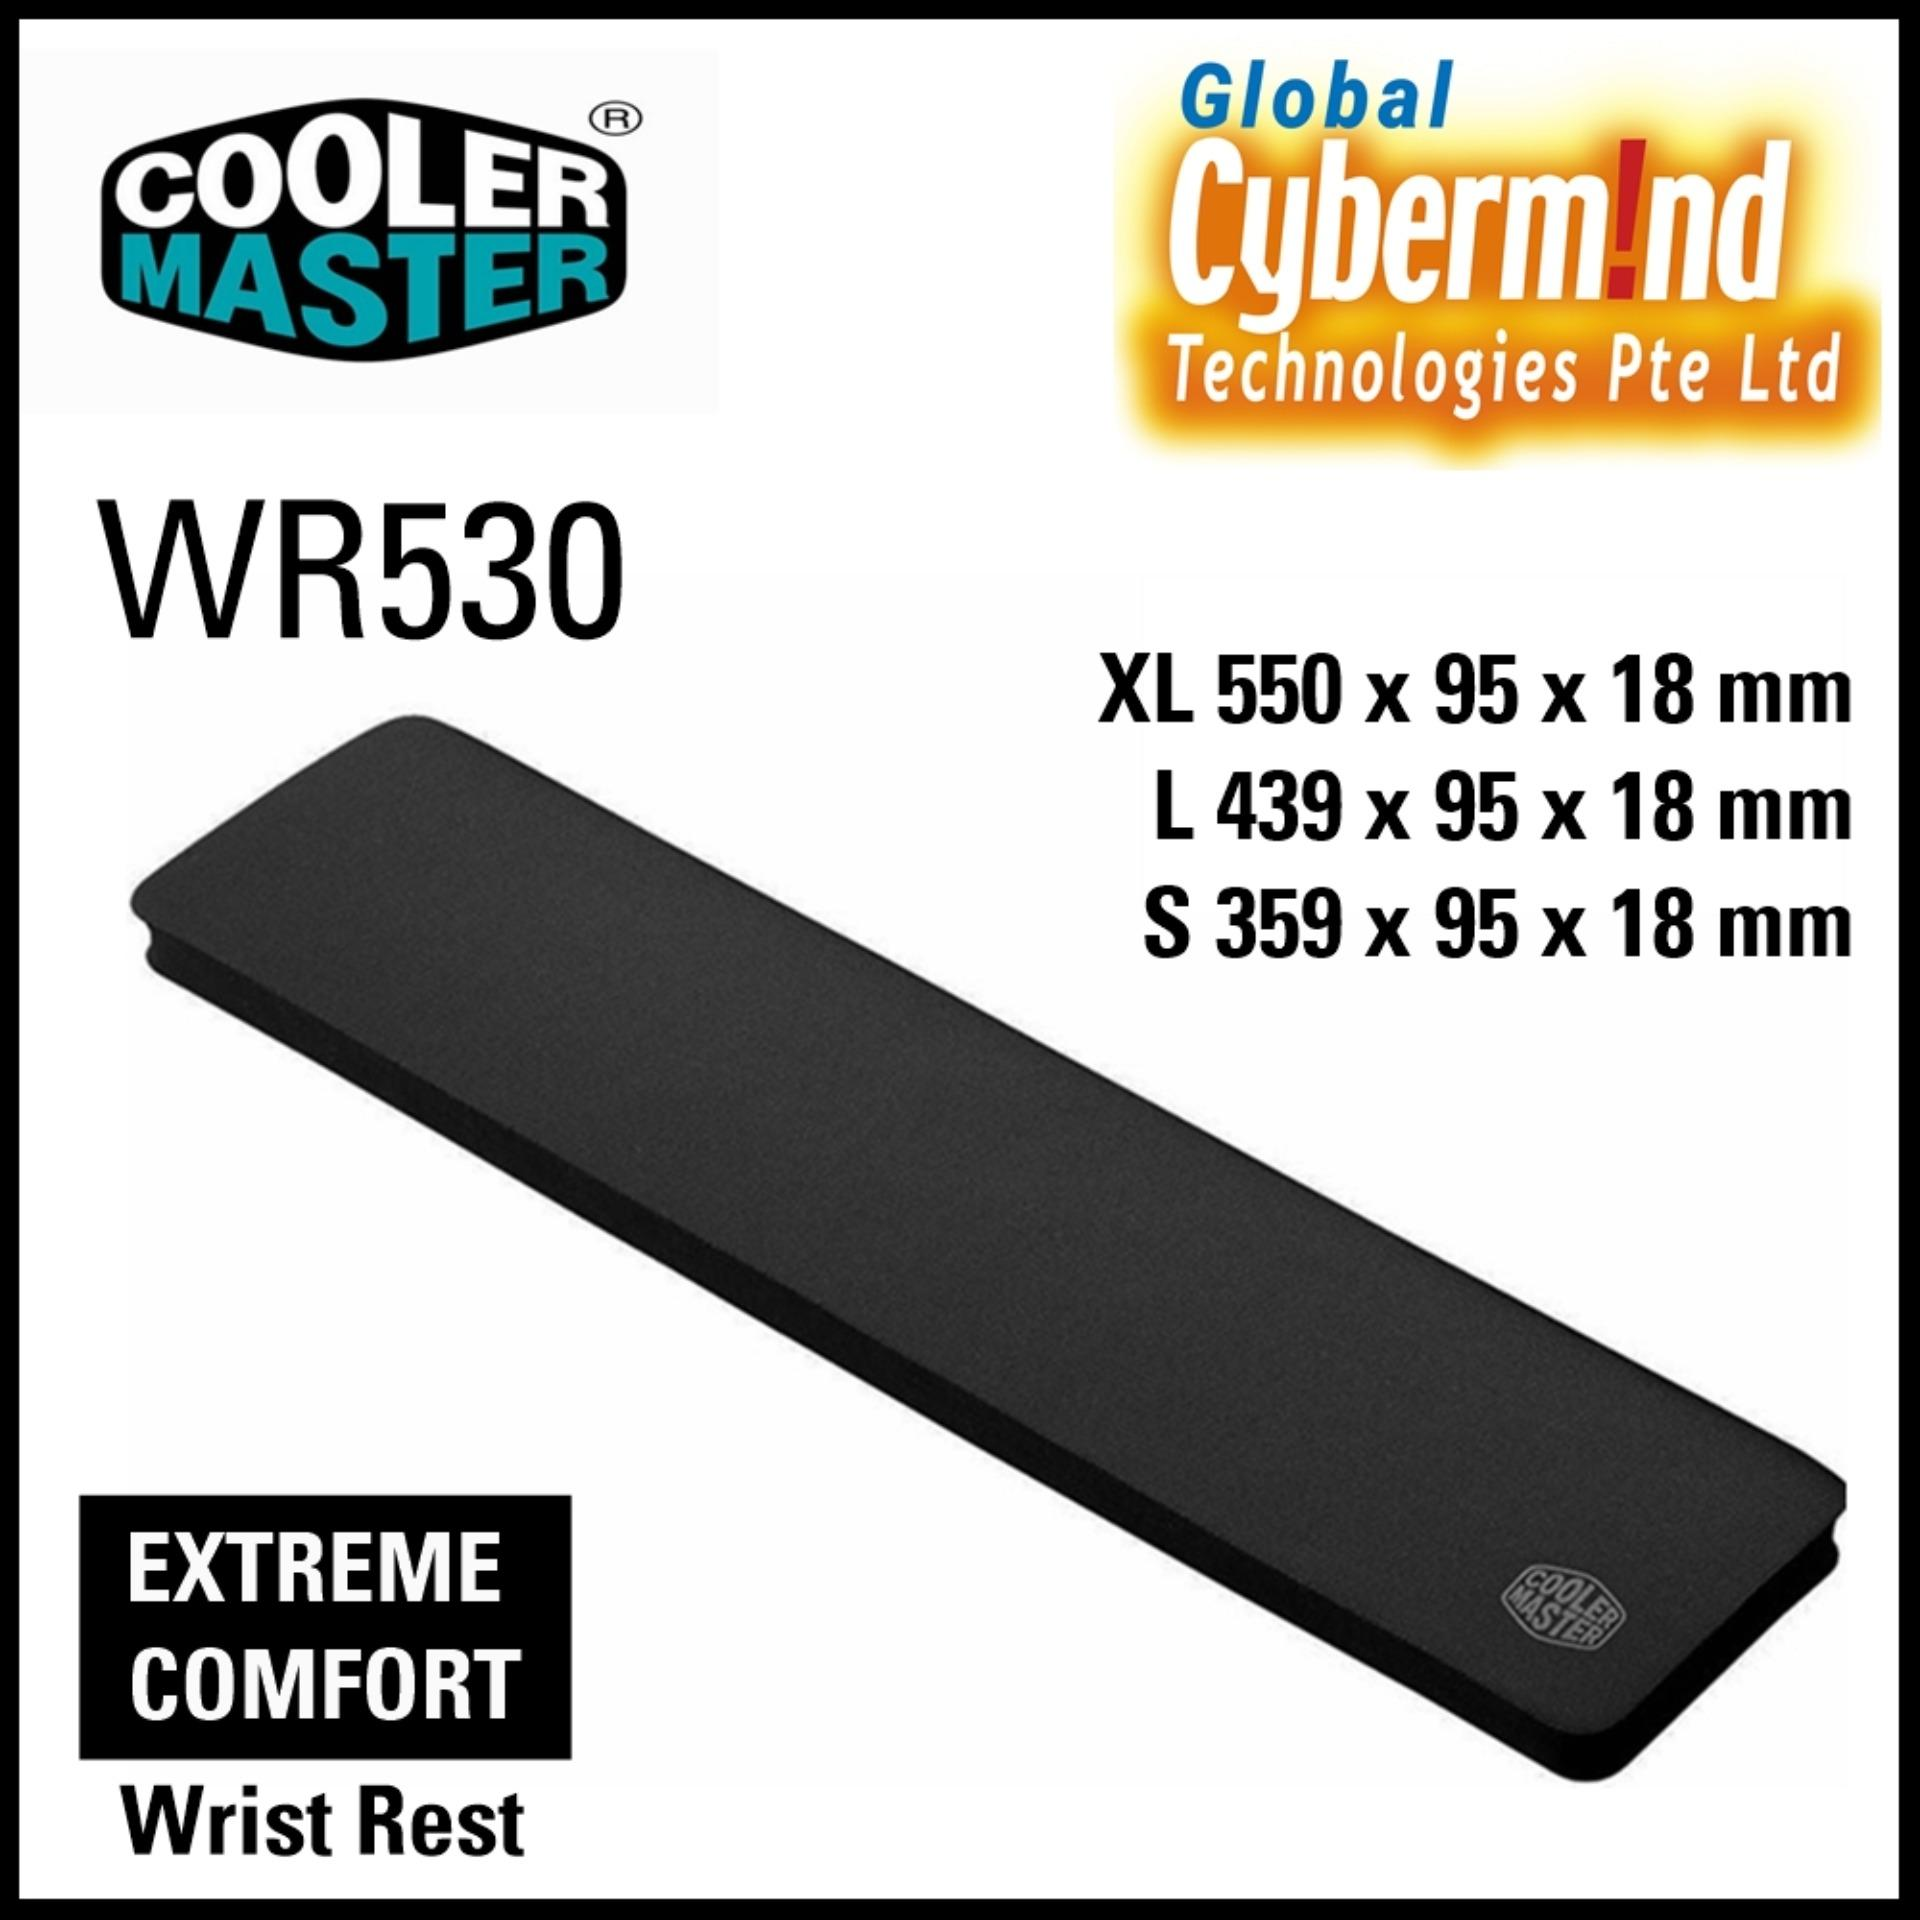 Cooler Master WR530 Wrist Rest Small Black 359 x 95 x 18 mm